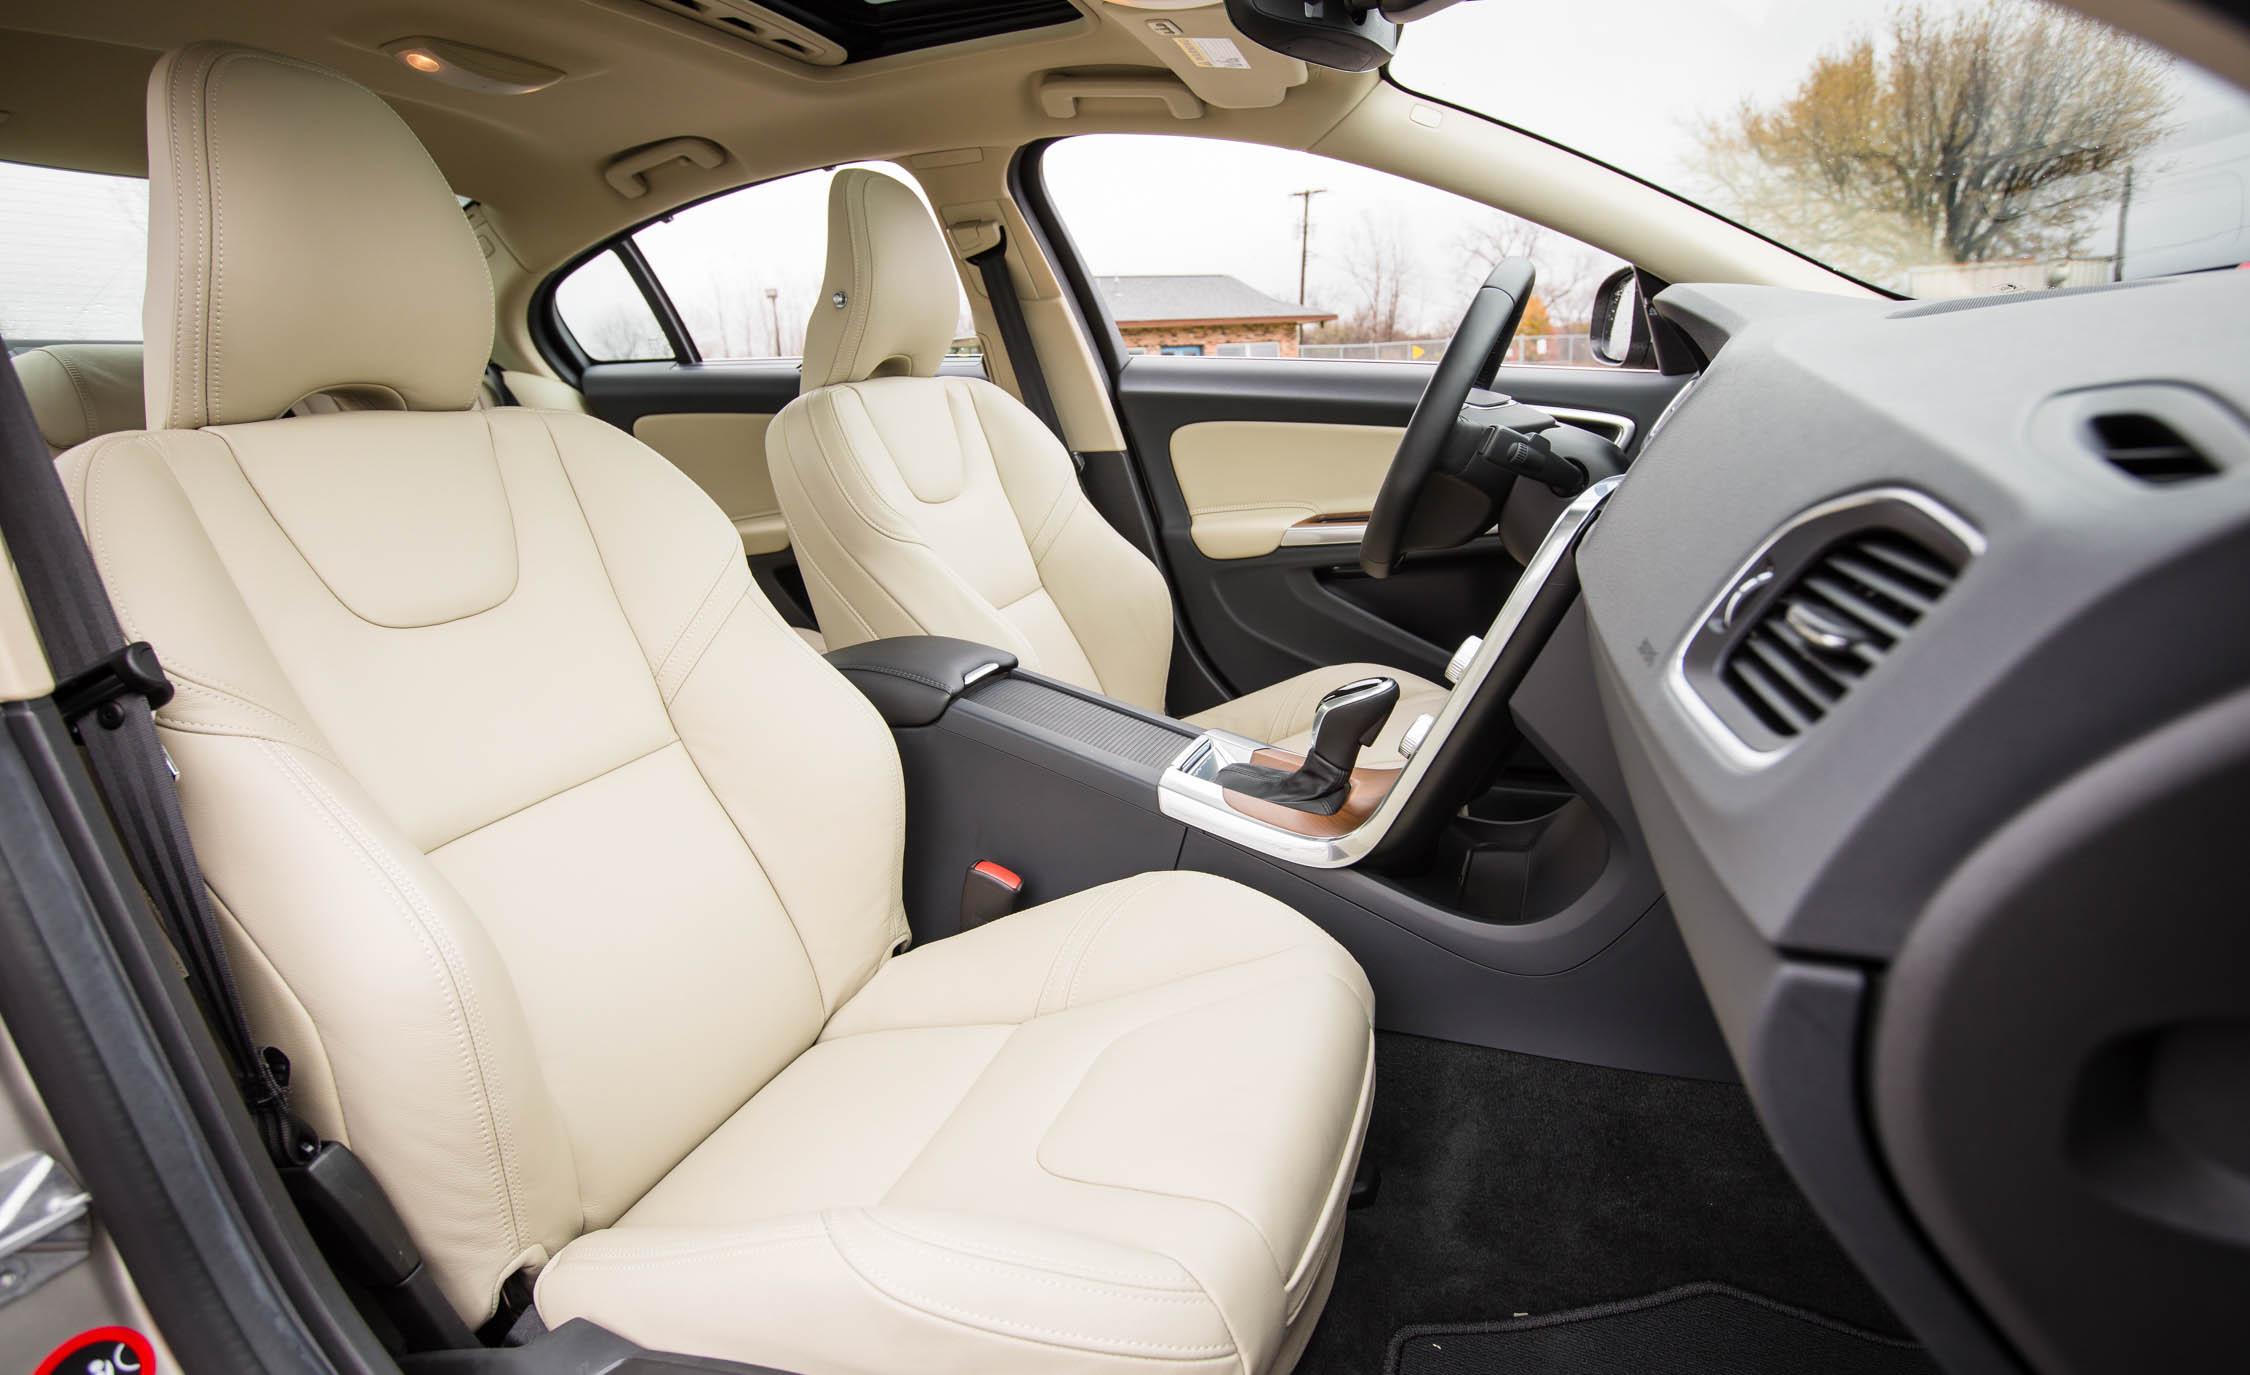 2016 Volvo S60 T5 Inscription Interior Passenger Seats Front